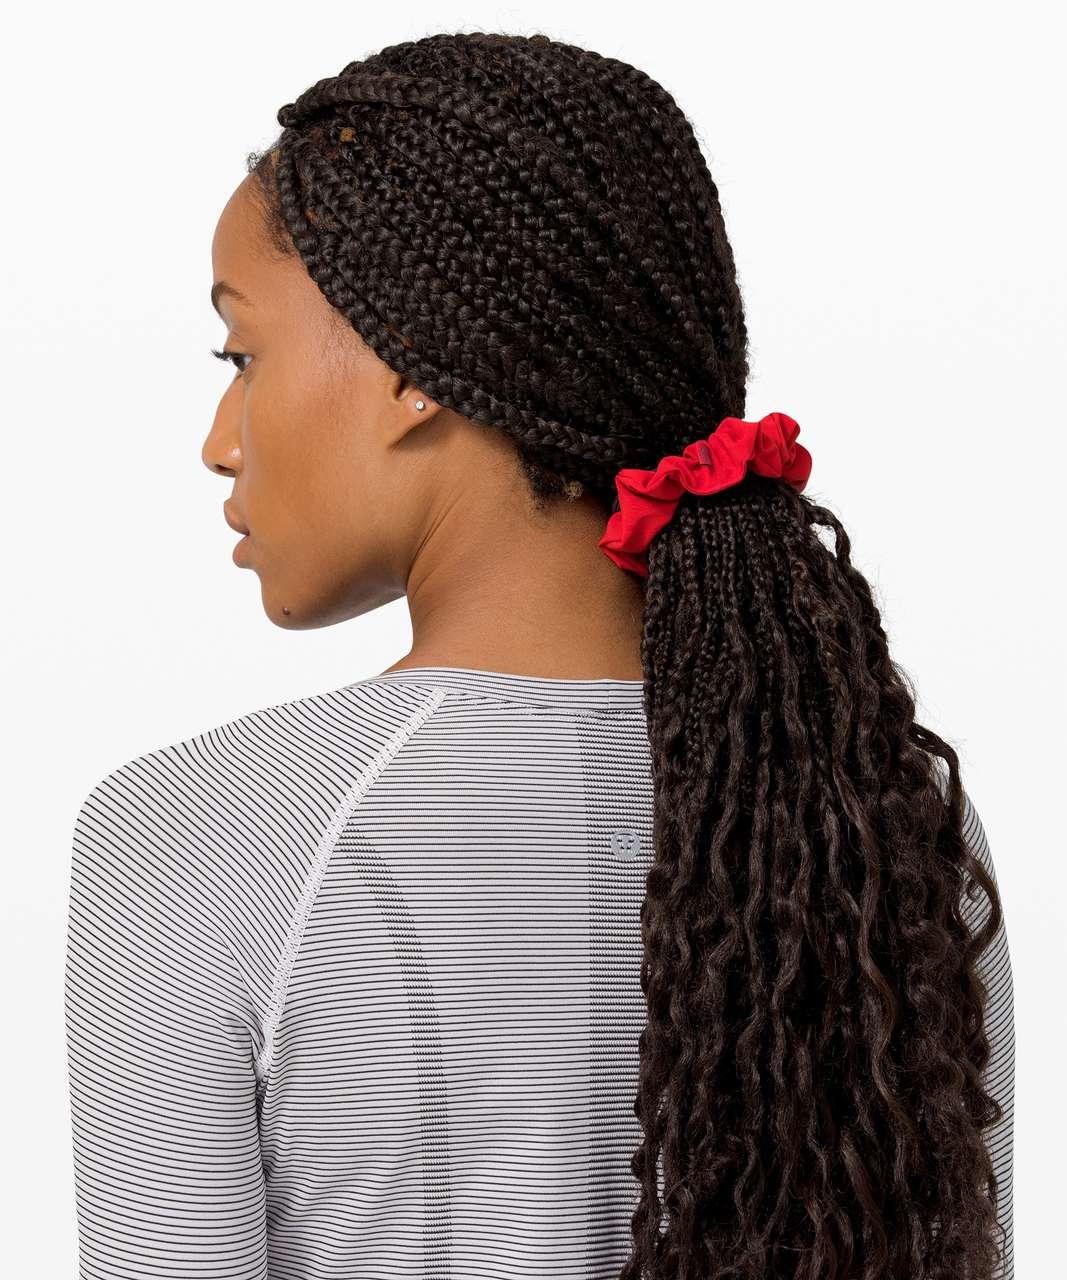 Lululemon Uplifting Scrunchie - Dark Red